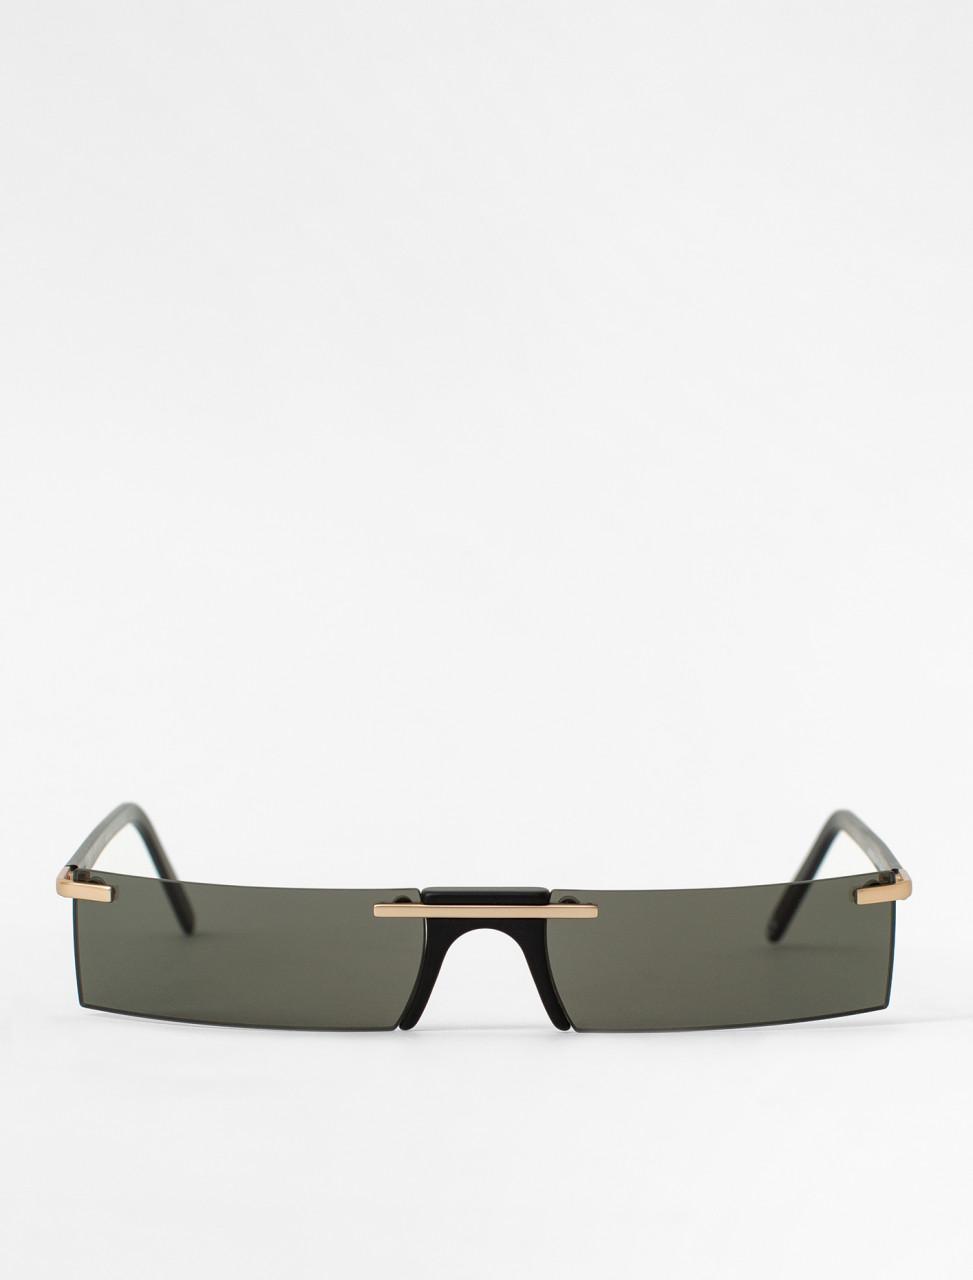 Wentworth Sunglasses